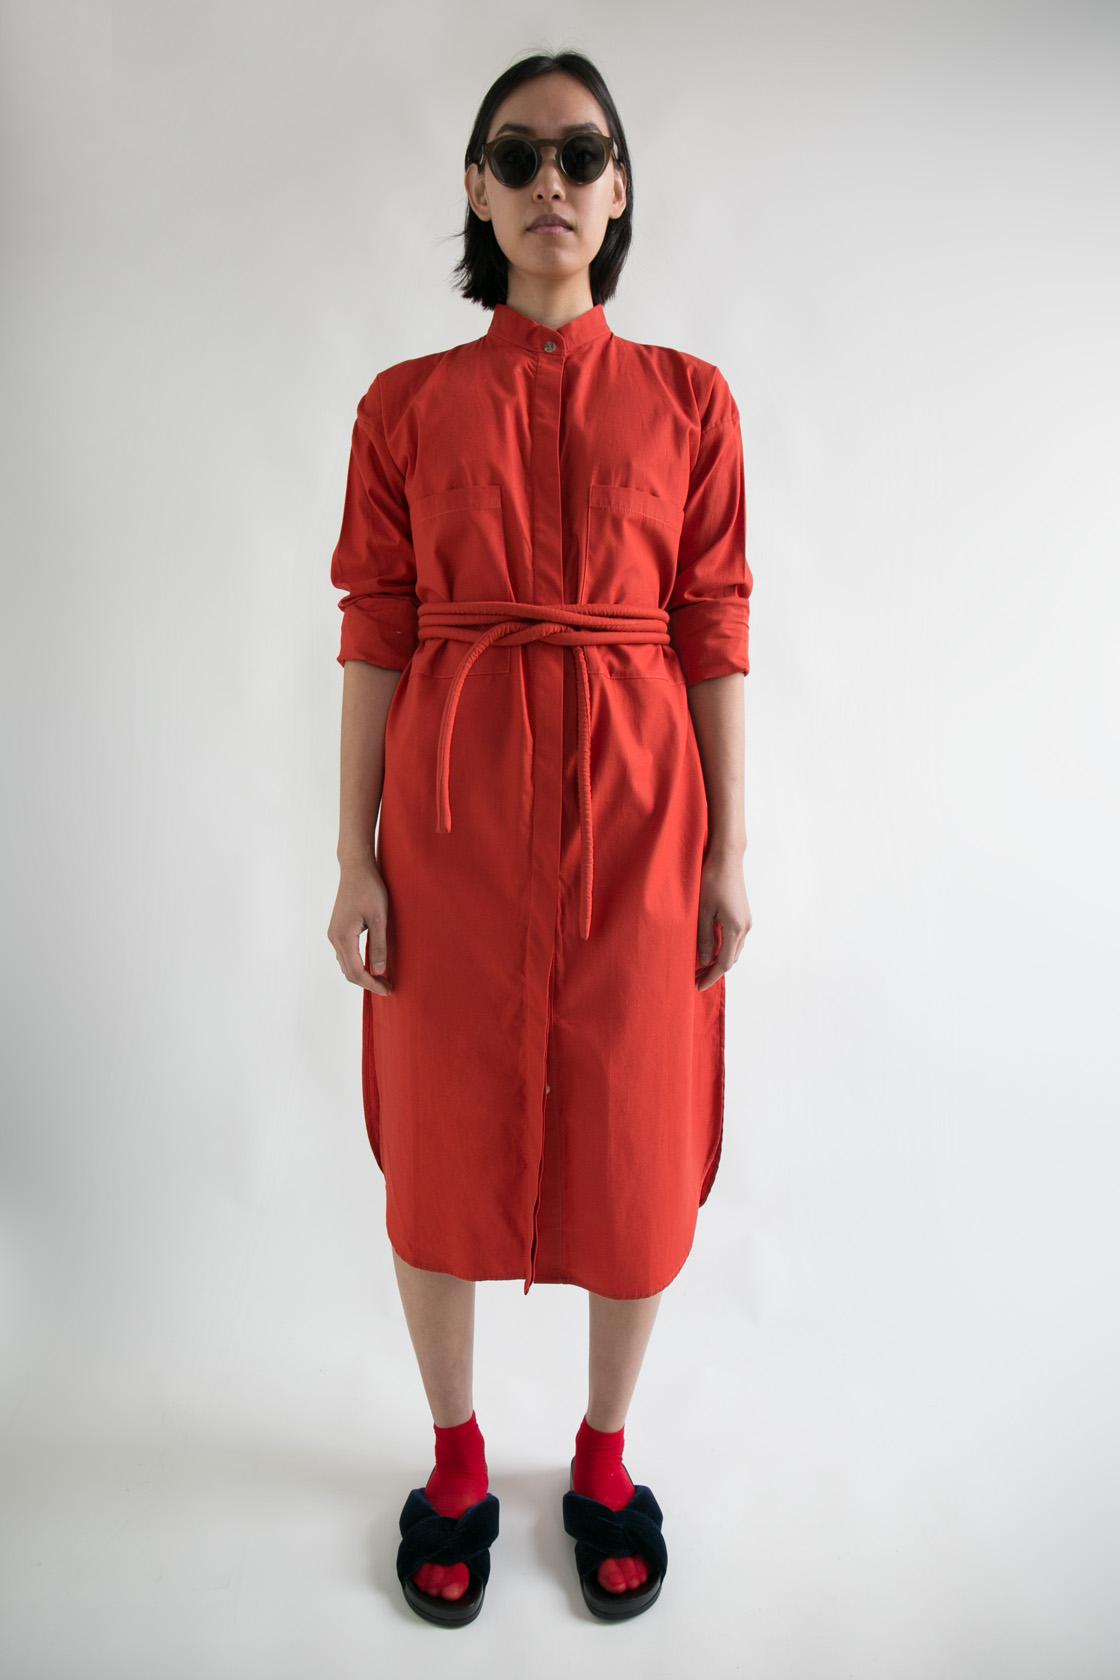 Dicet Button Up Dress #350.00